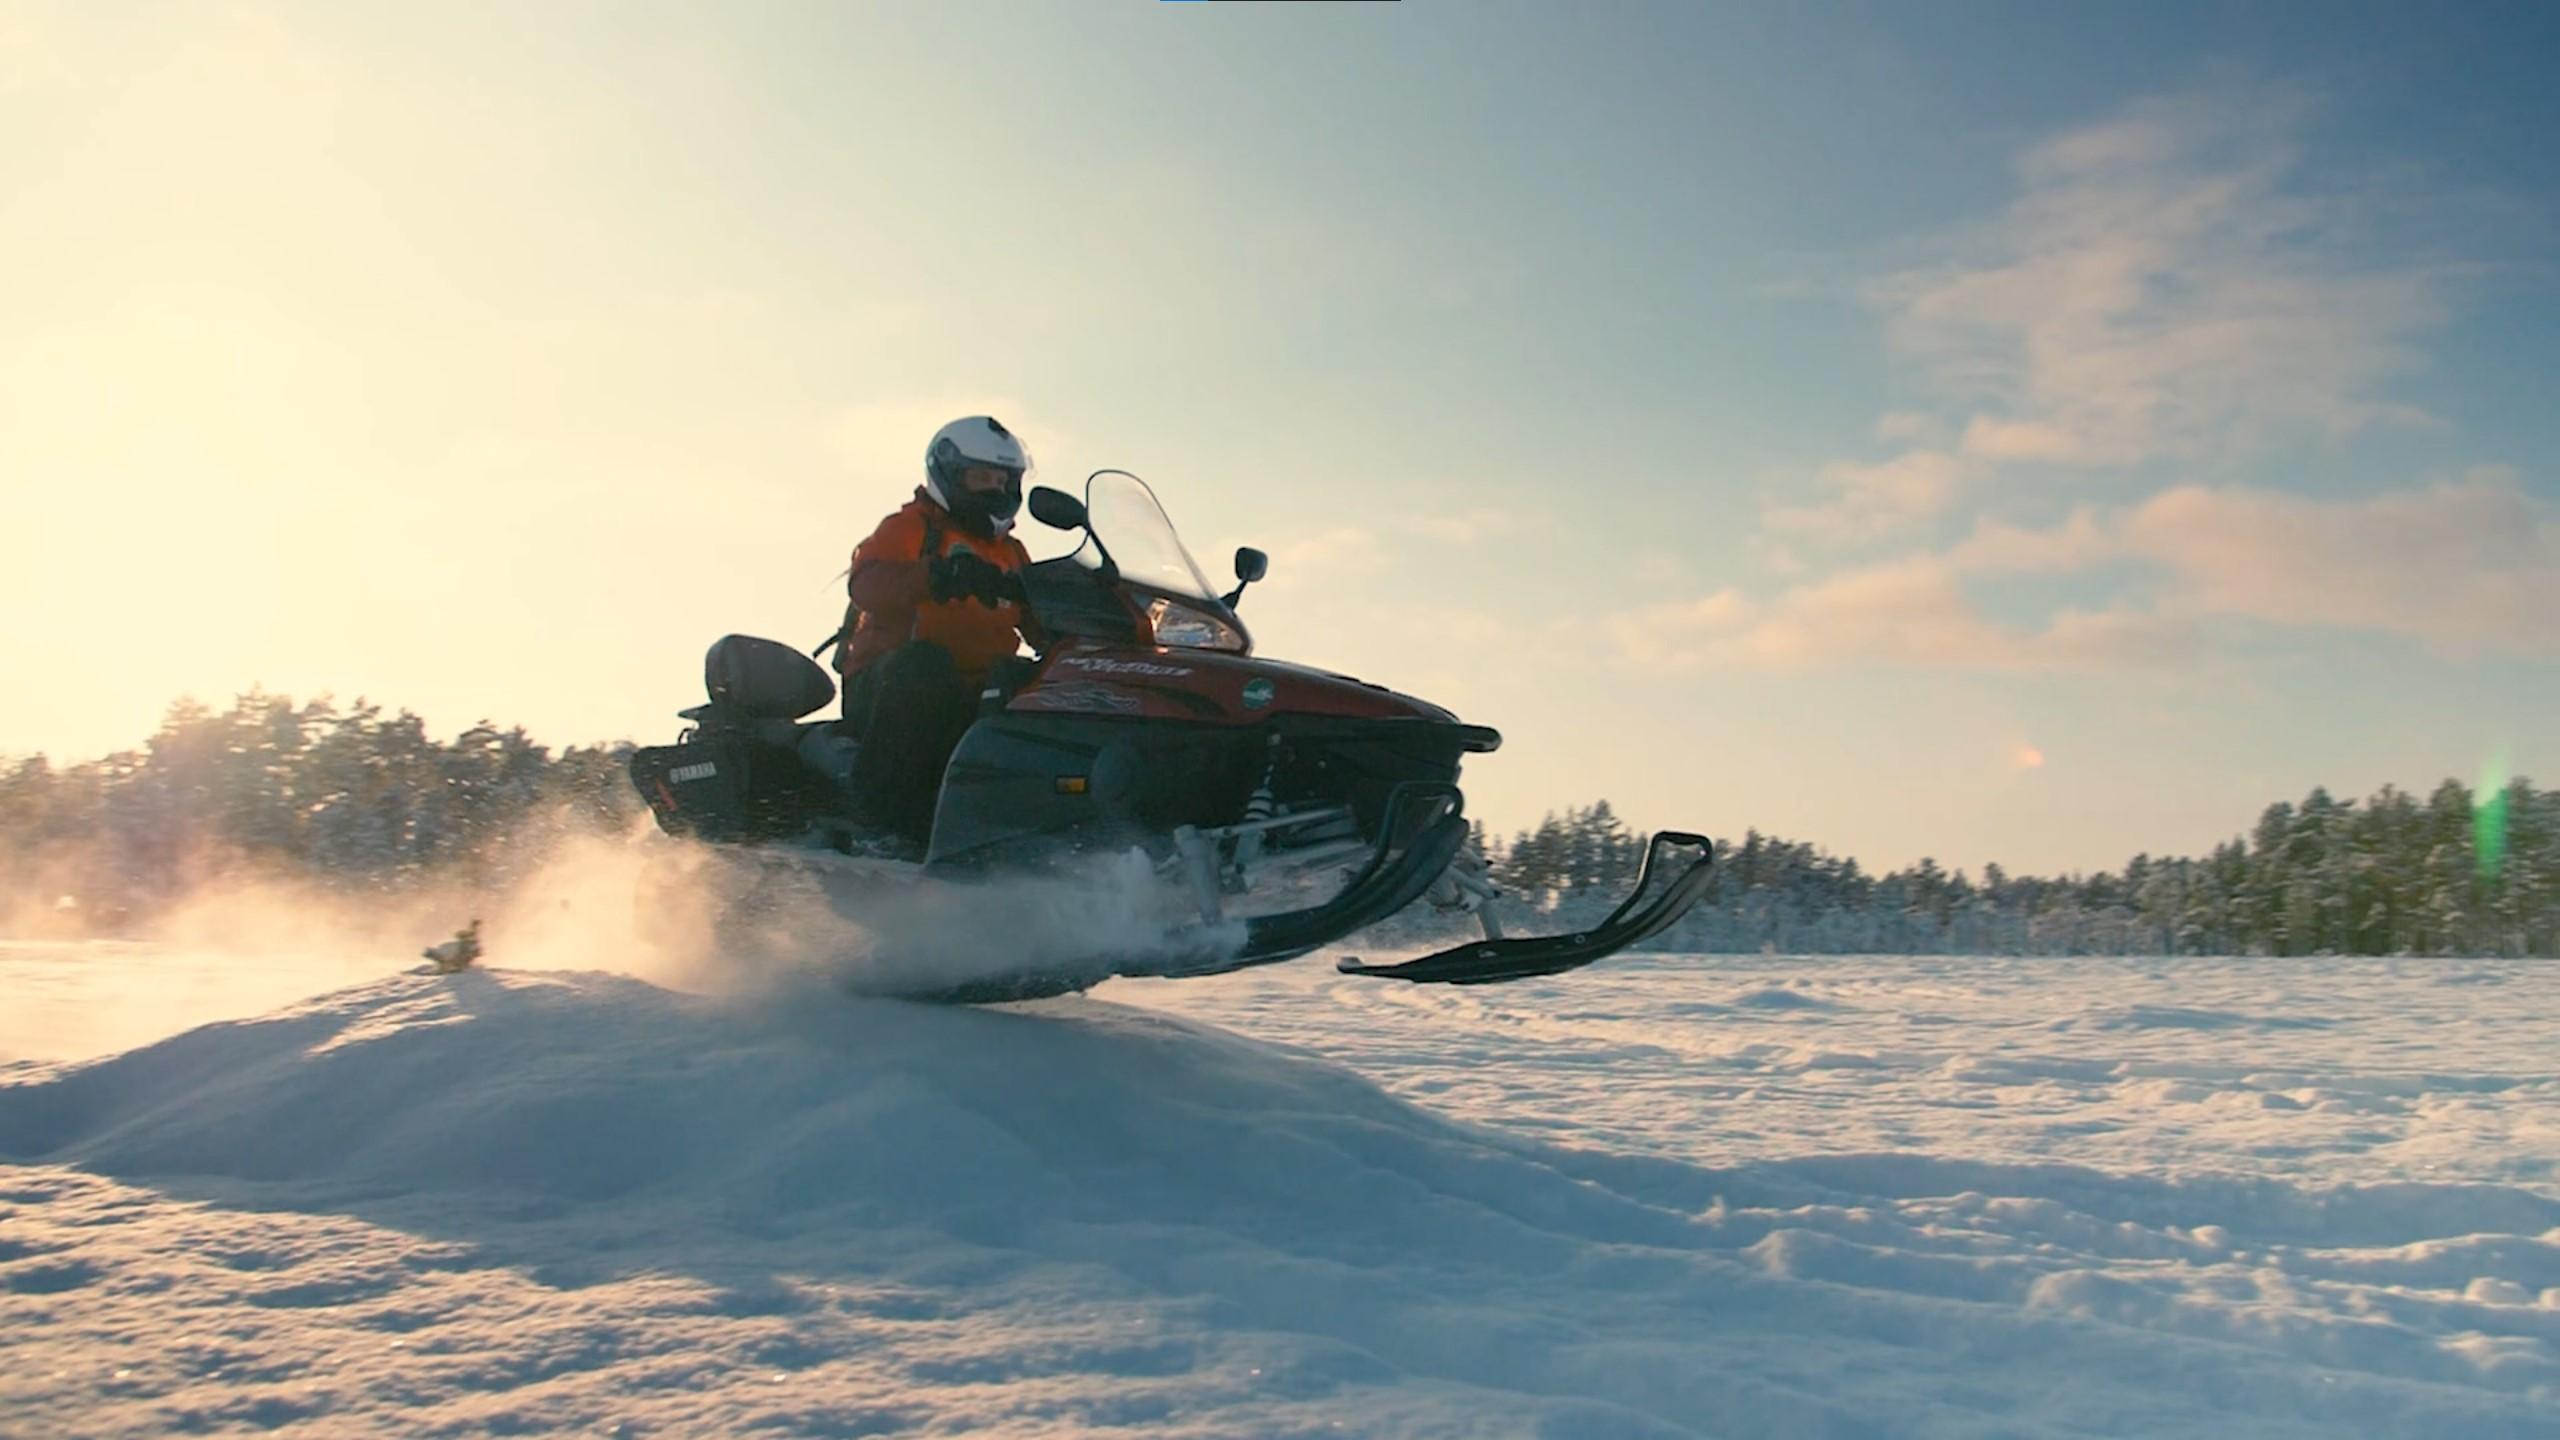 Snowmobile doing a jump in winterlandscape